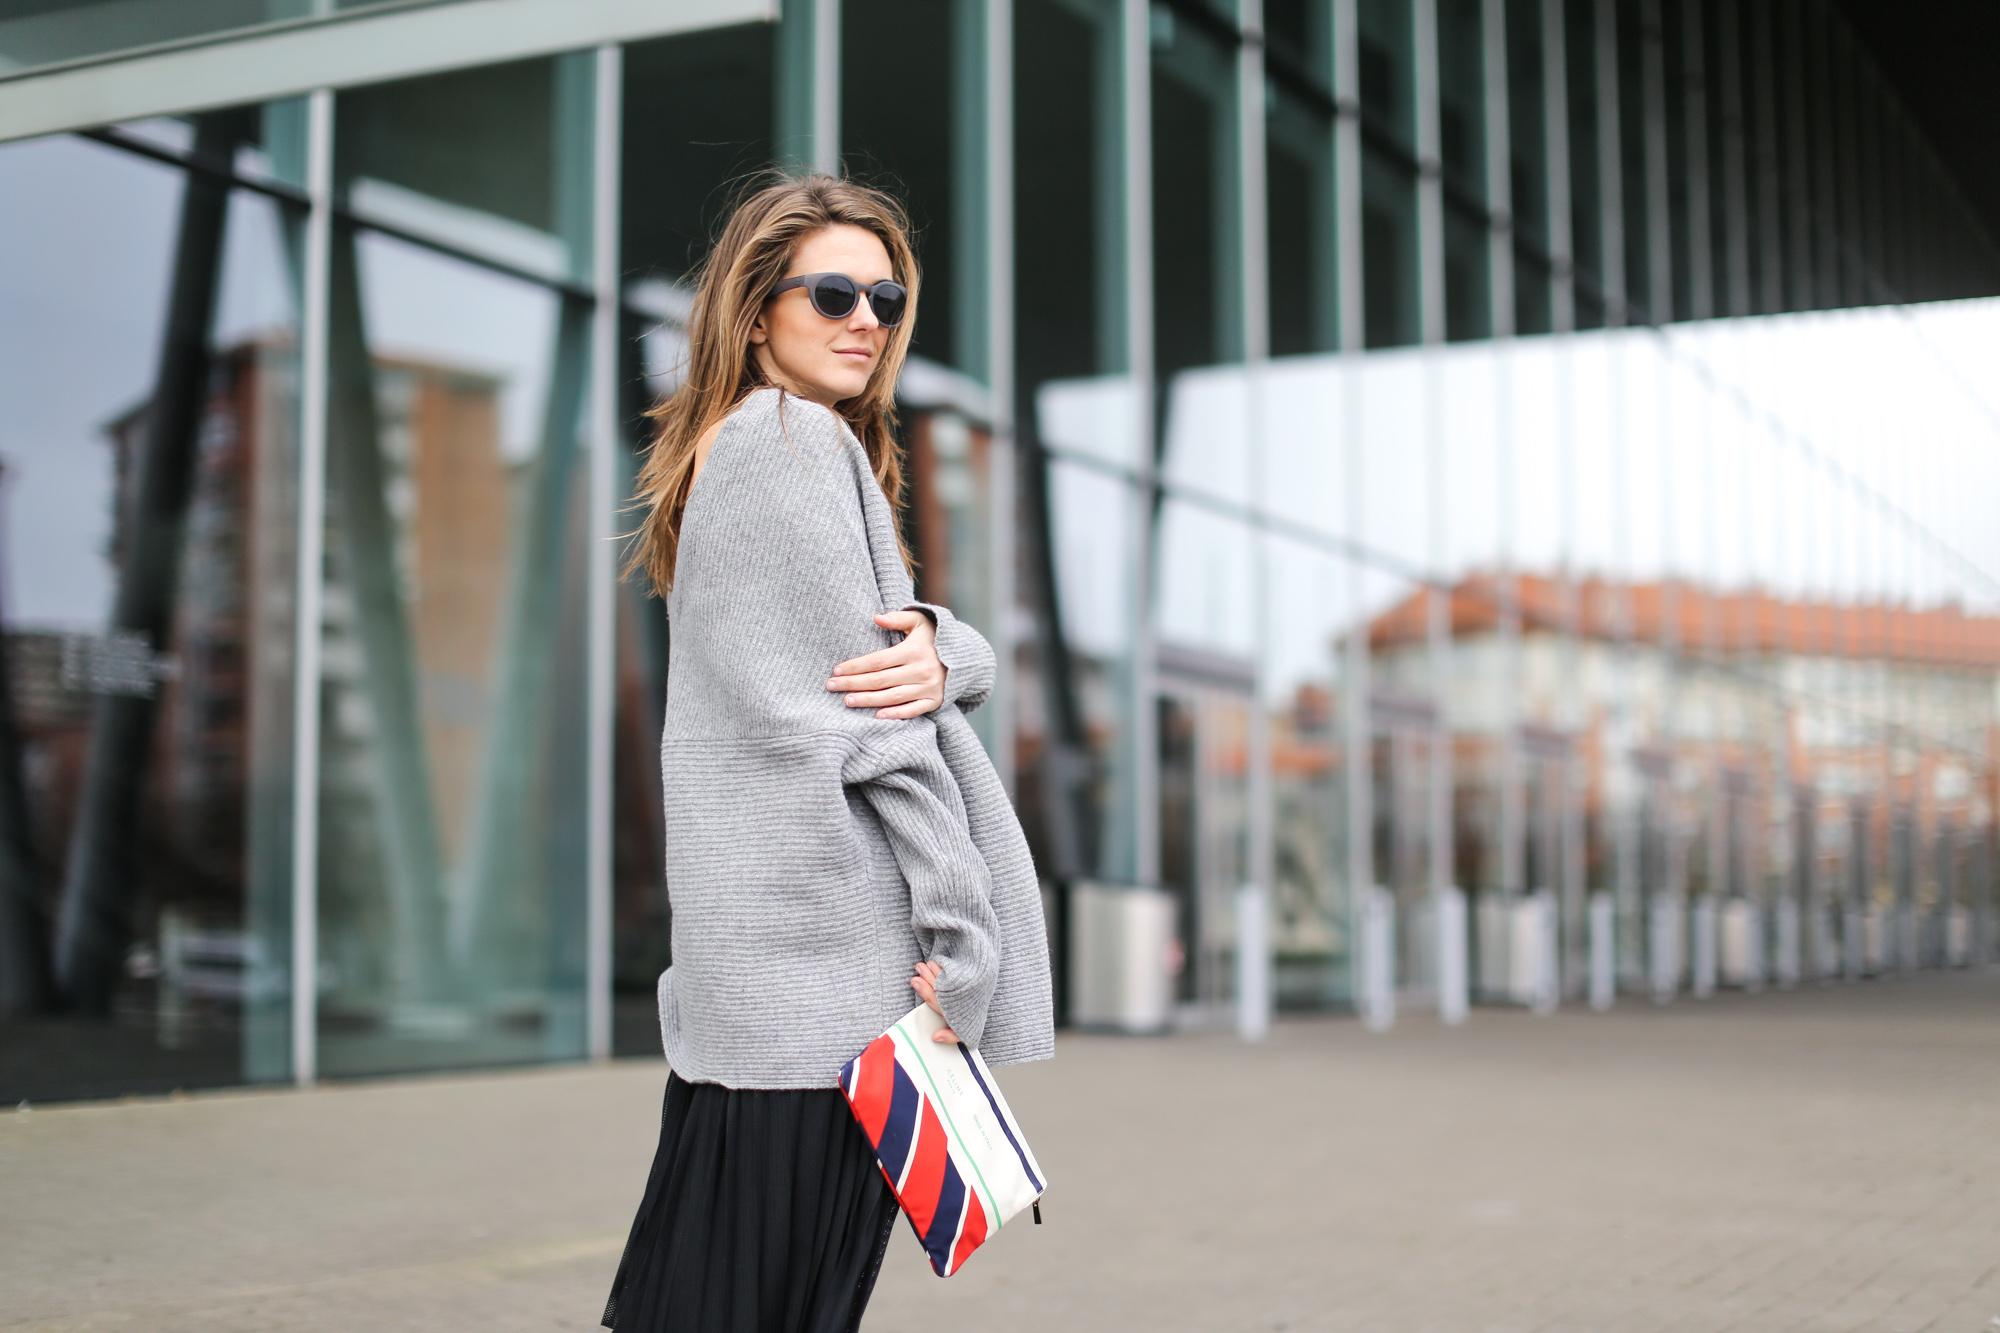 Clochet-streetstyle-zara-oversized-grey-knit-adidas-gazelle-suiteblanco-falda-plisada-celine-paris-clutch-9